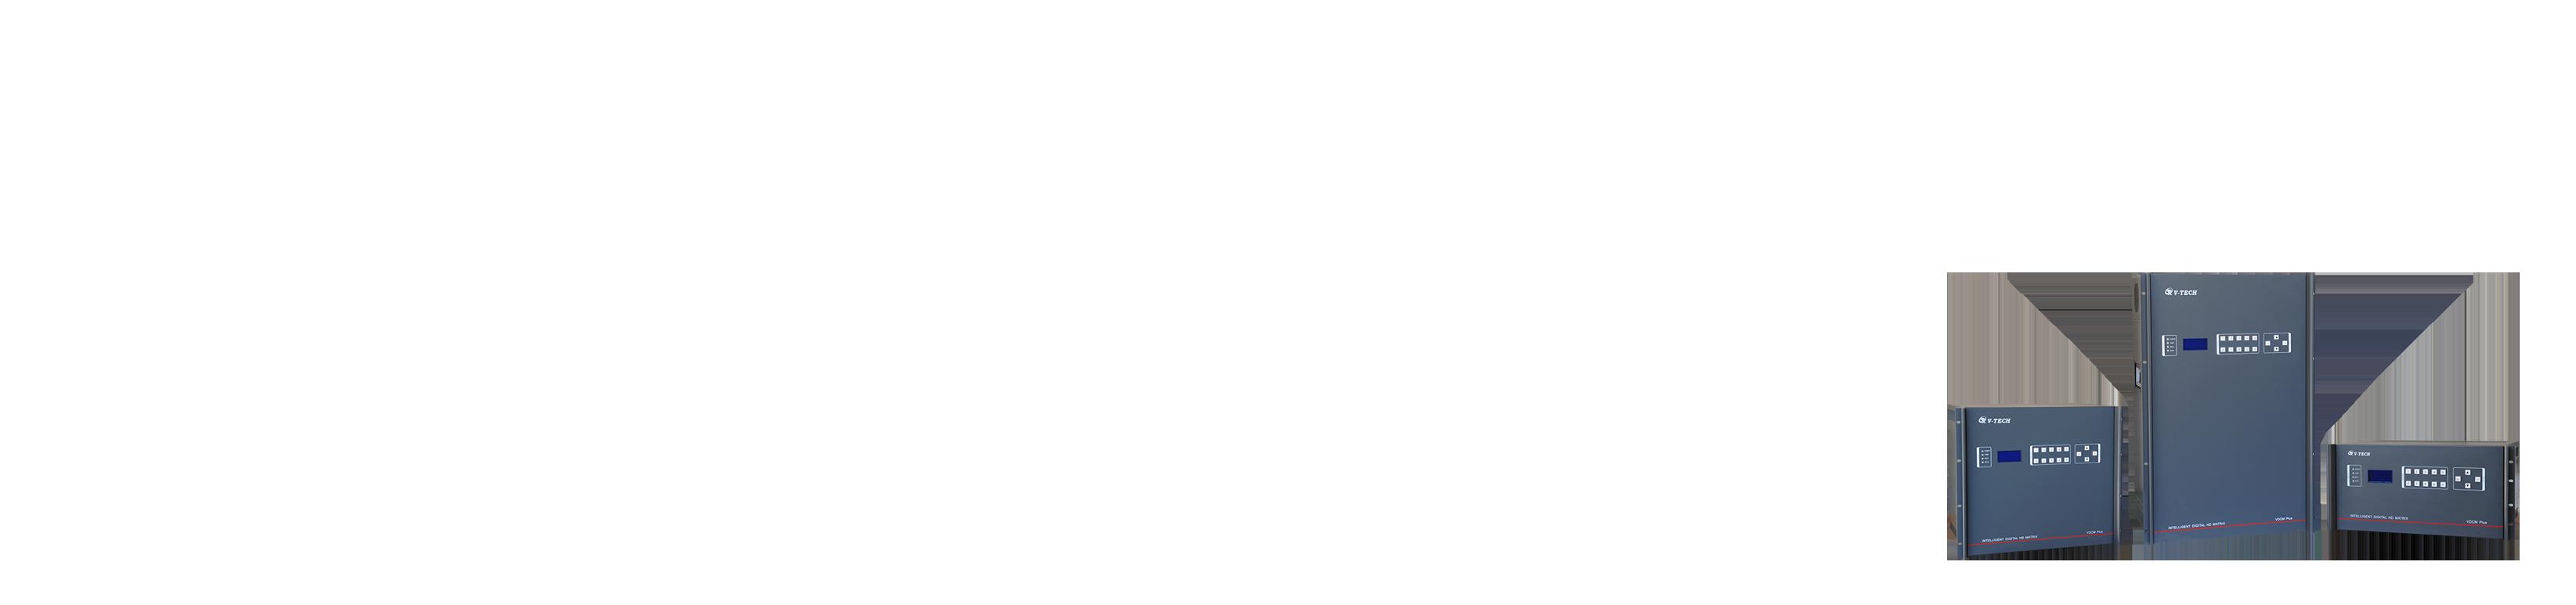 VDCM Plus 智能高清混合矩阵